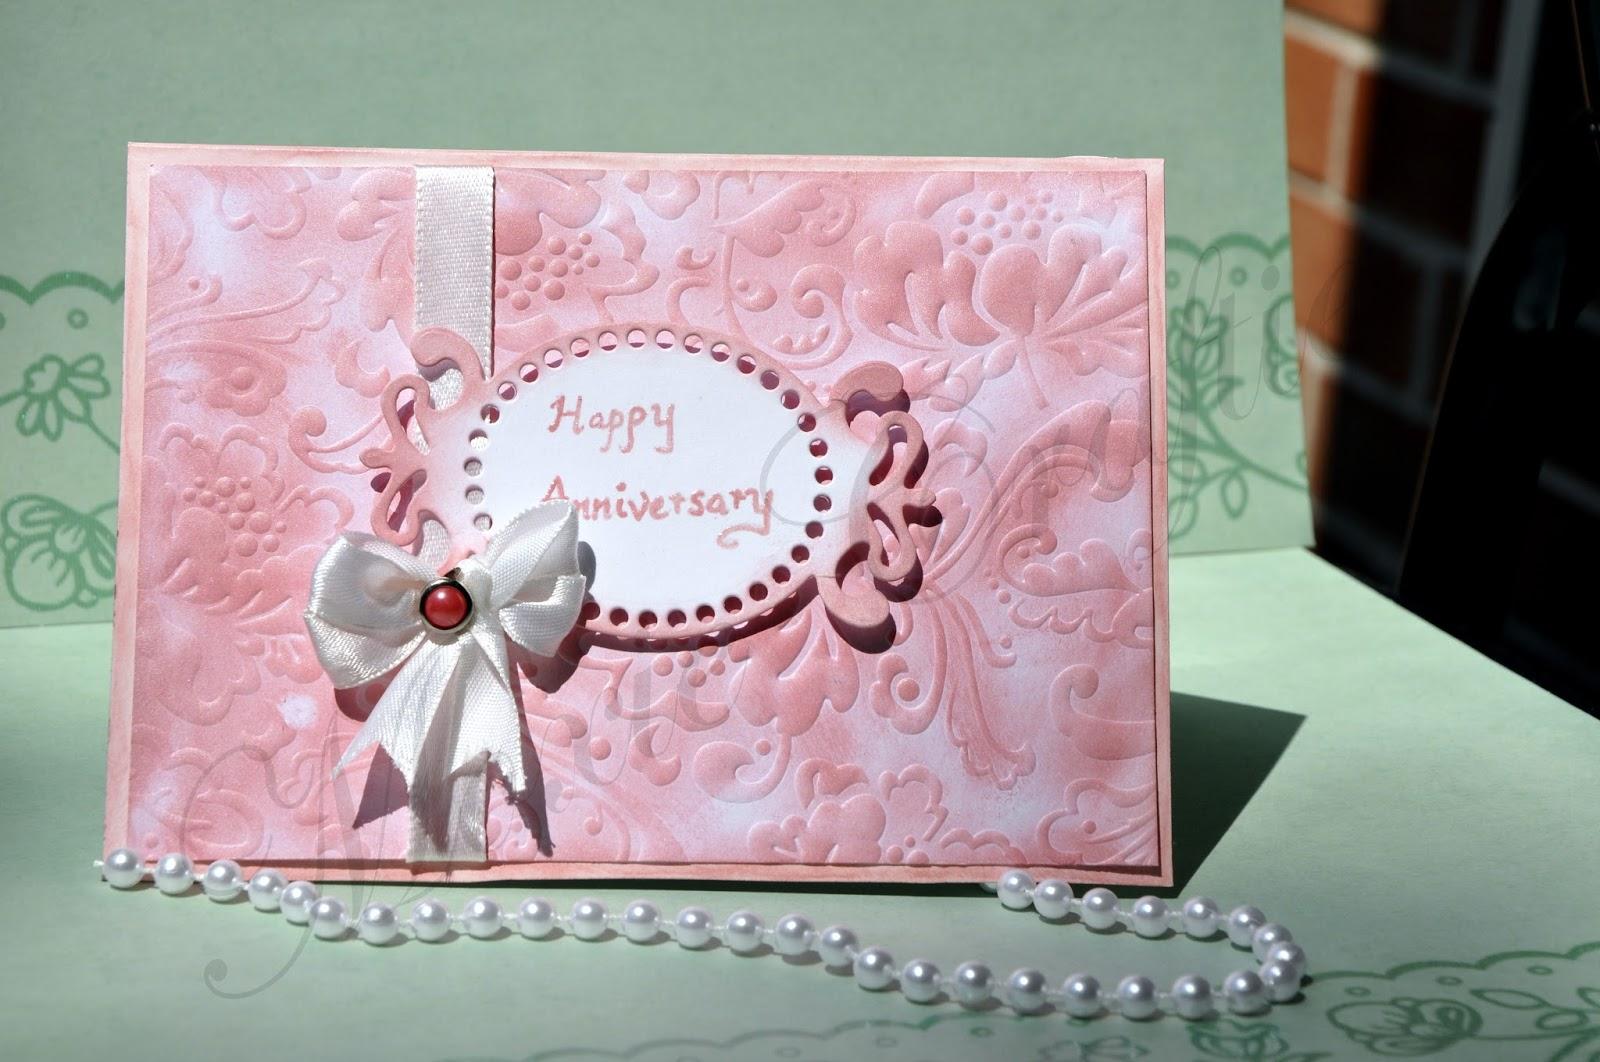 Moxie Craftie: Happy Anniversary